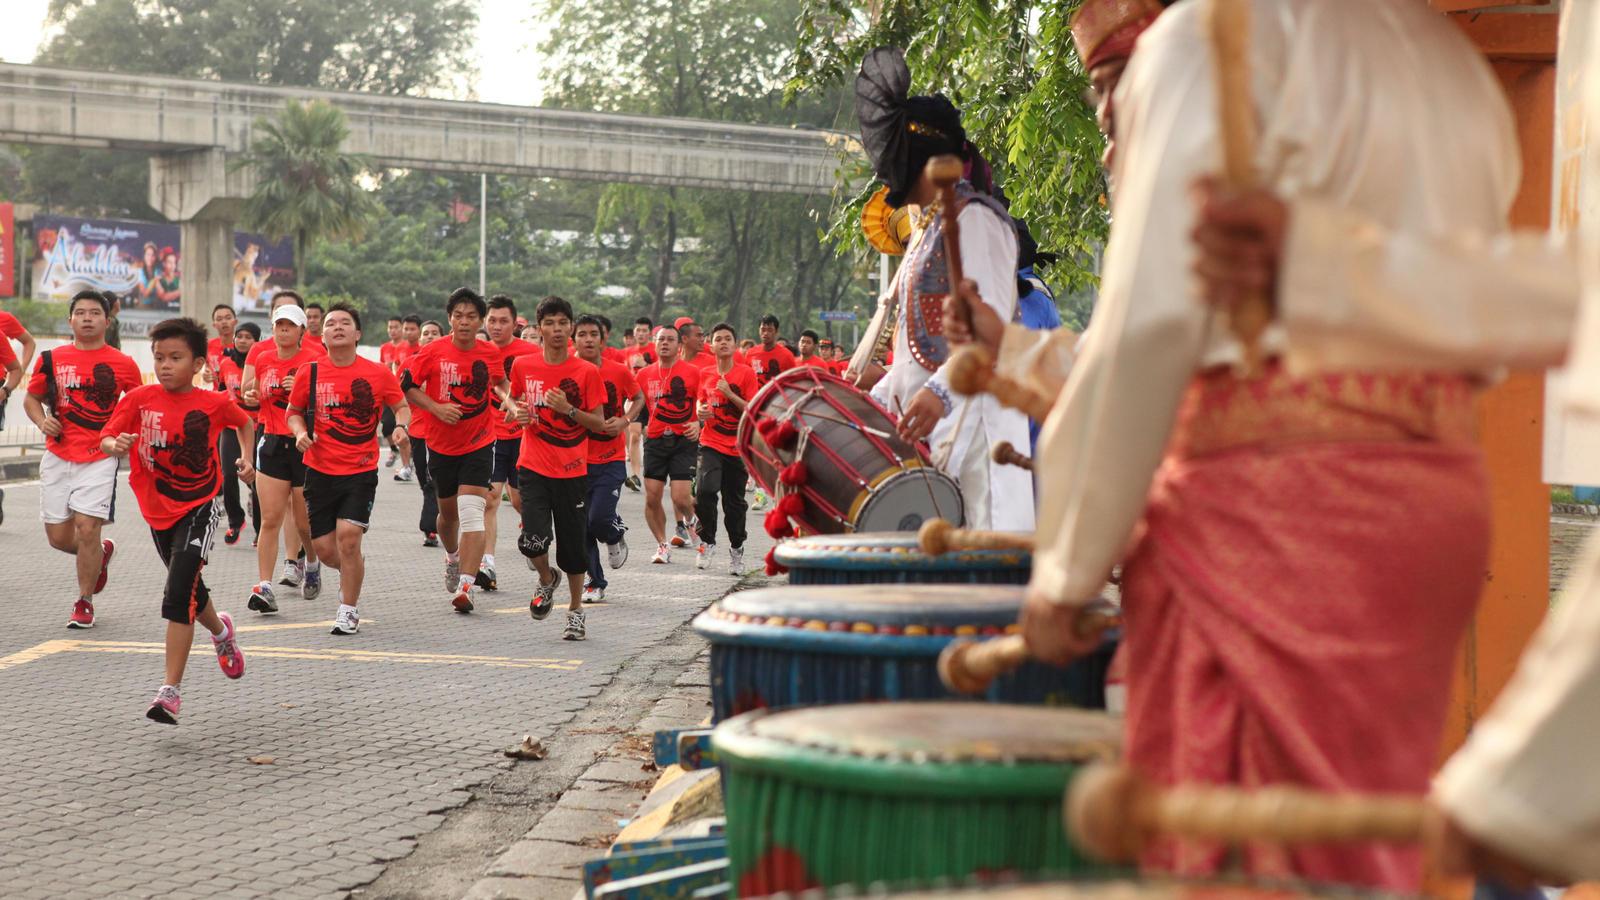 Nike Running We Run 2012 12. Nike Running We Run 2012 13.  Nike Running We Run 2012 14. Nike Running We Run 2012 15.  Nike Running We Run 2012 16 c8c7c273e5b7